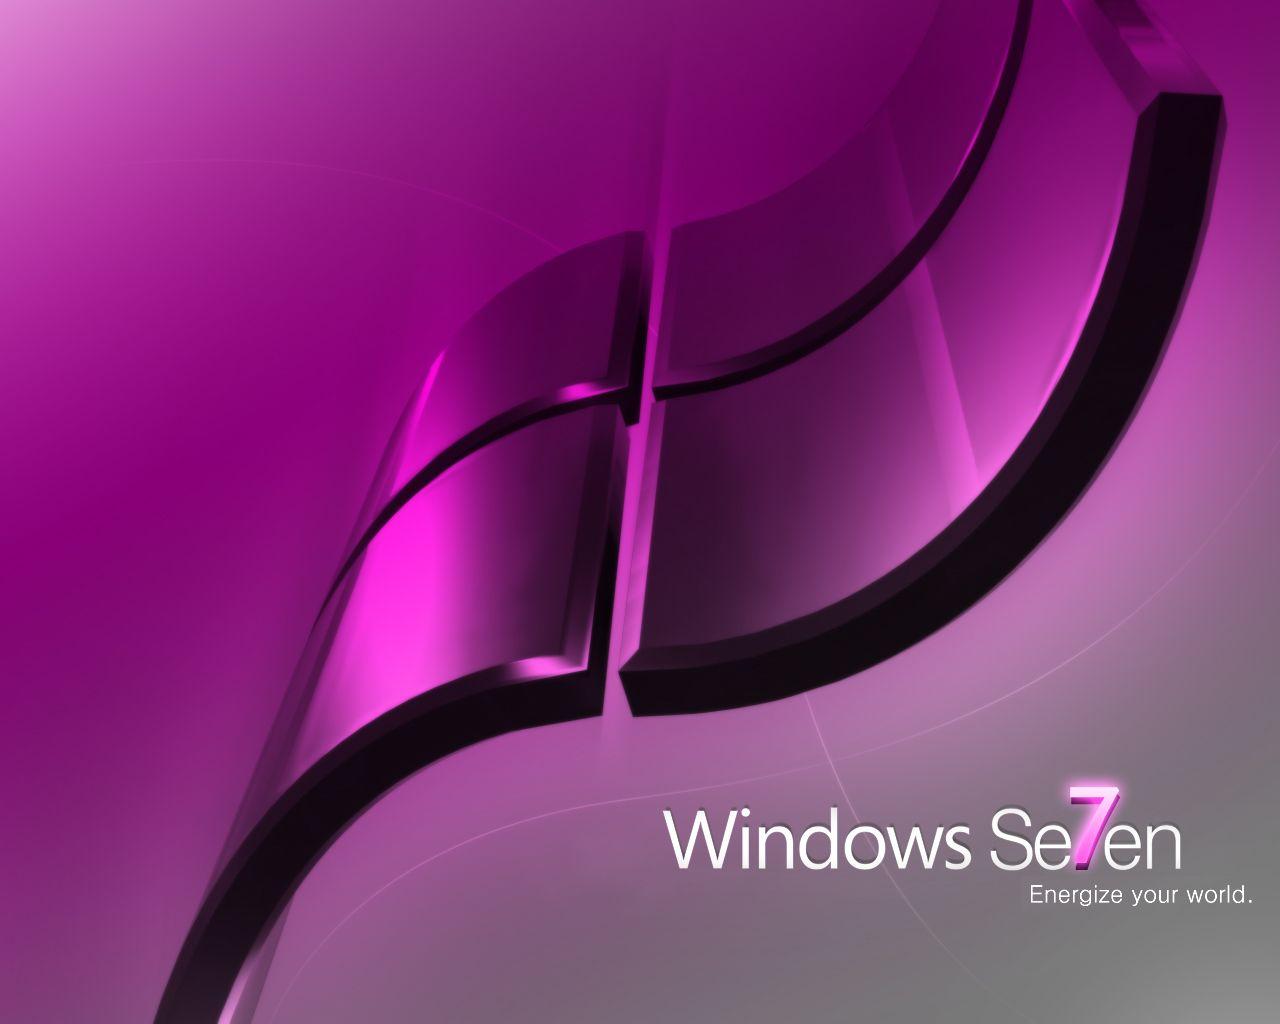 windows touch hd hd desktop wallpaper high definition mobile